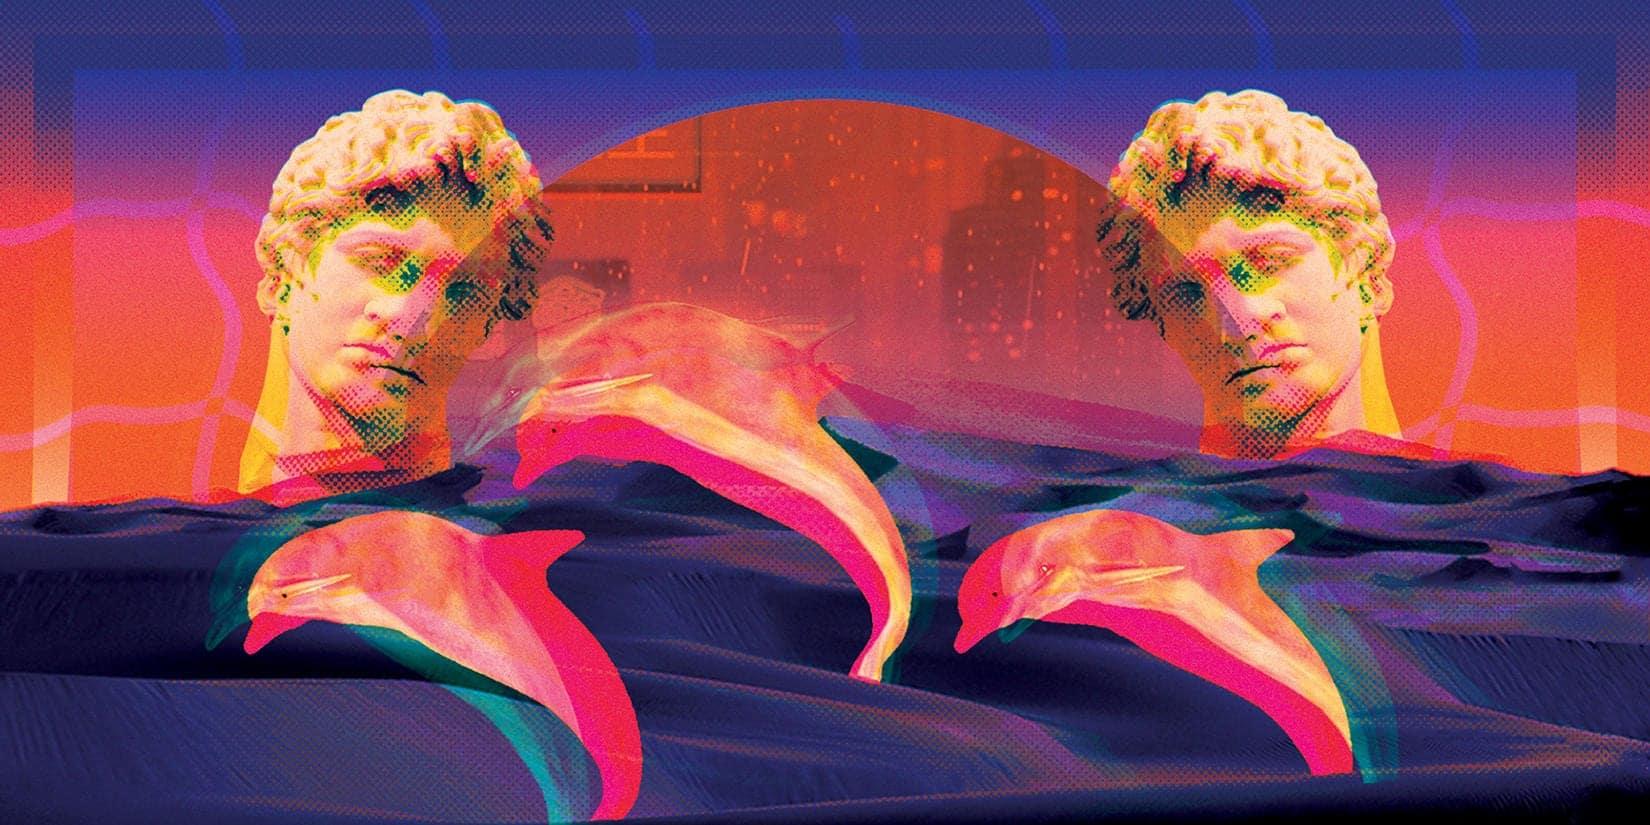 Ilustración Vaporwave Natasha Hassan